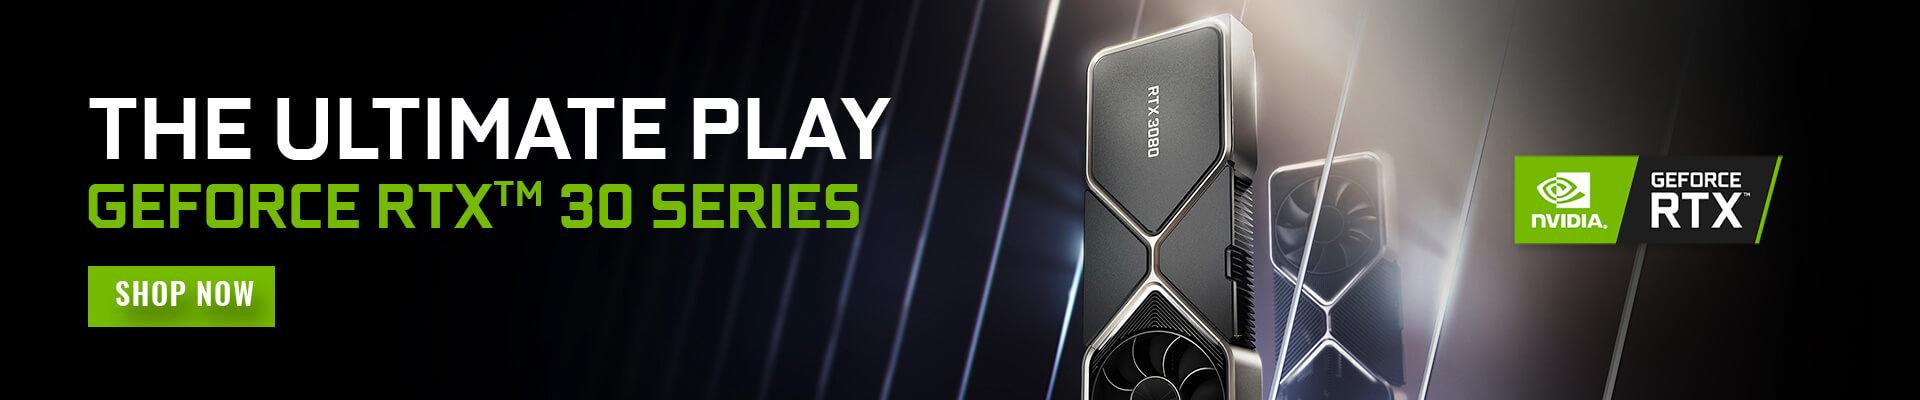 GeForce RTX 30 Series - Buy Now